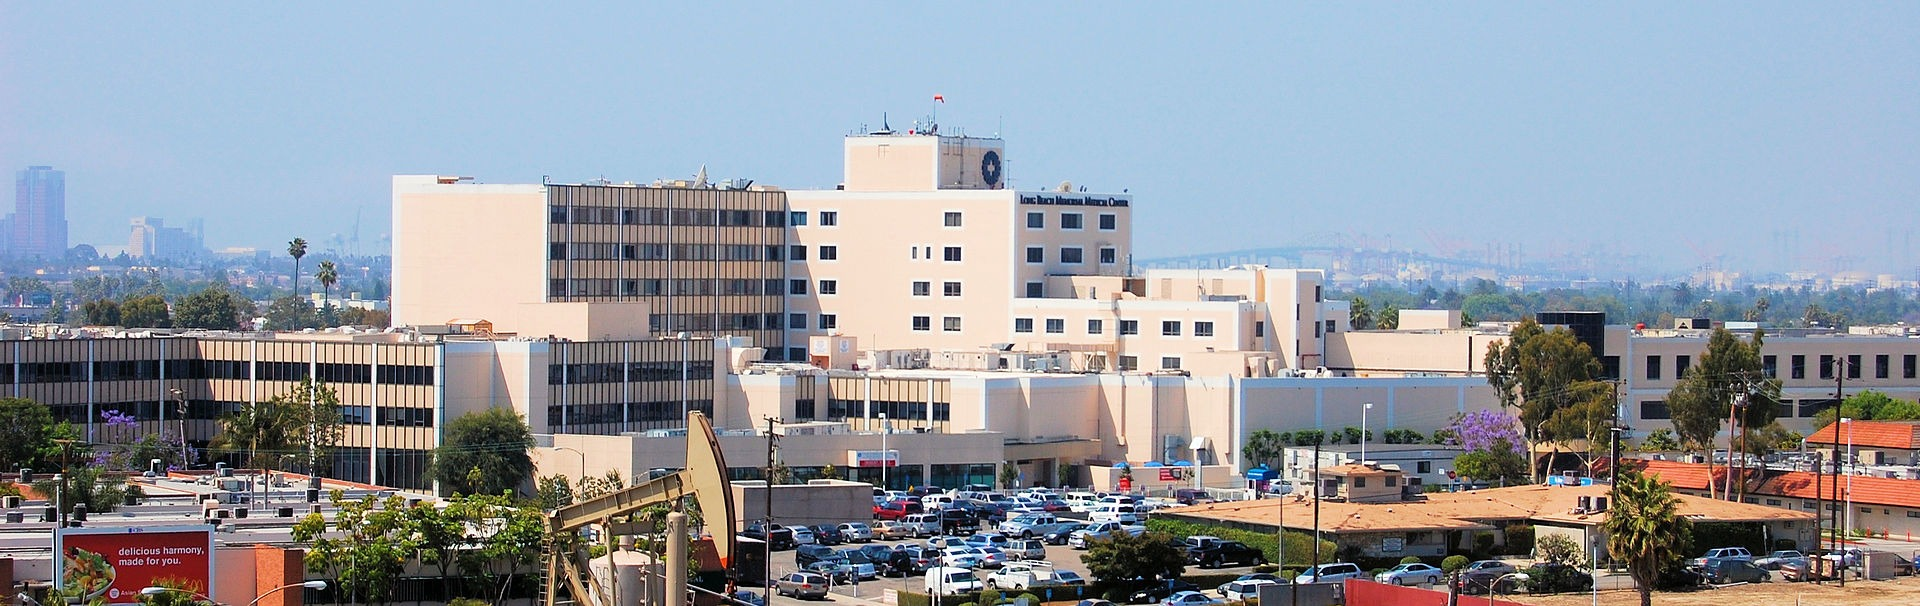 1920px-Long_Beach_Memorial_Medical_Center